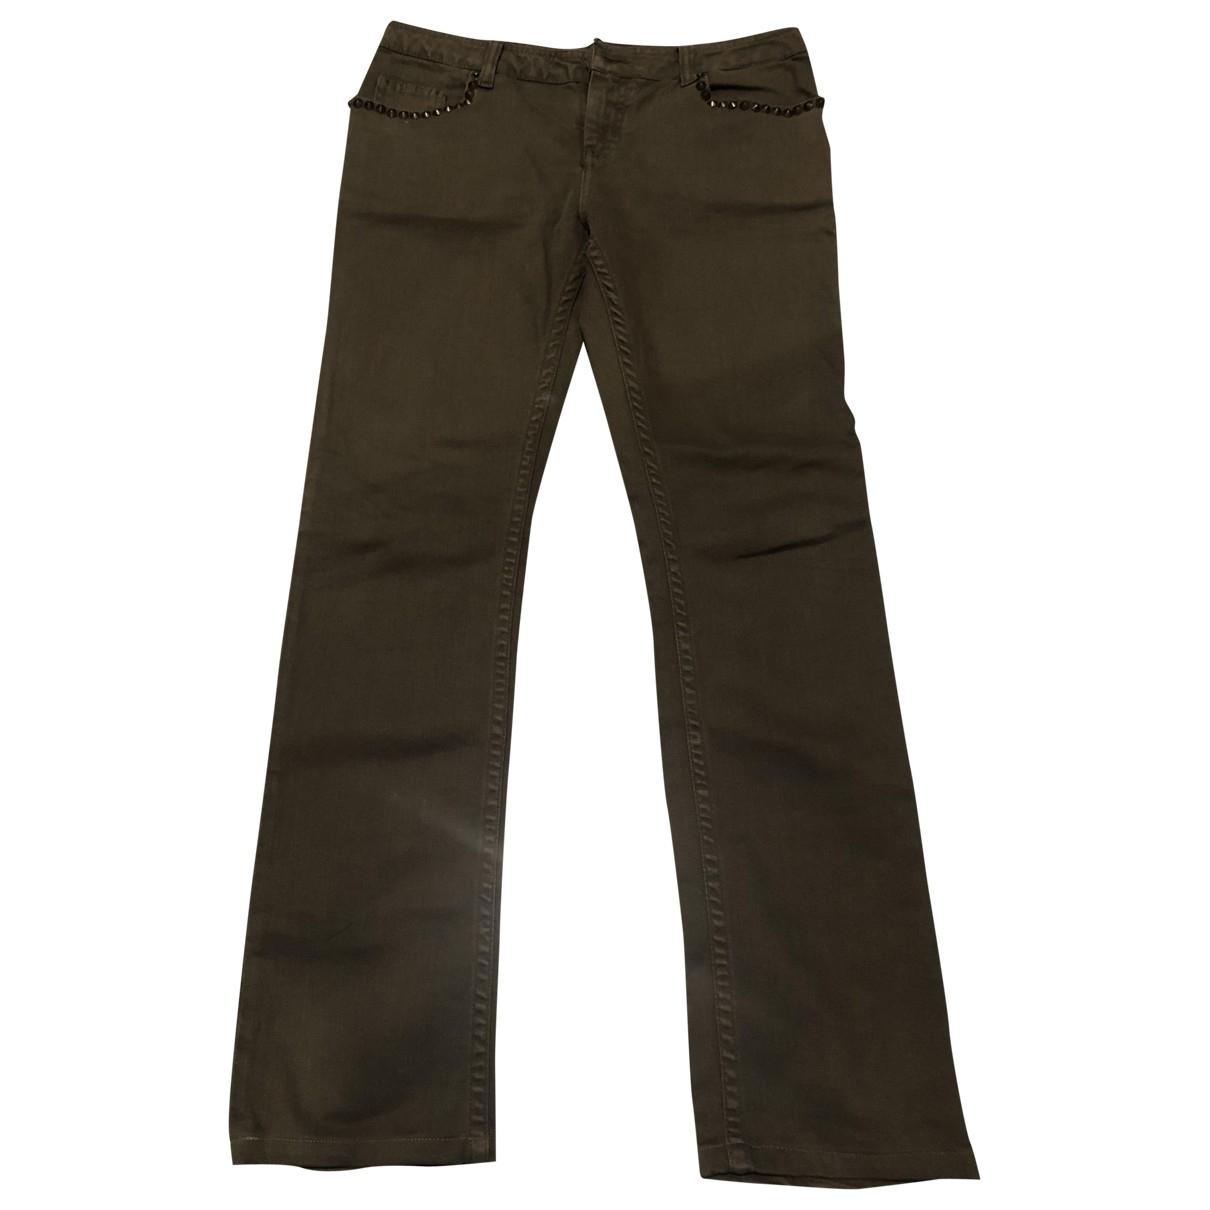 Zadig & Voltaire \N Khaki Cotton Jeans for Women 25 US